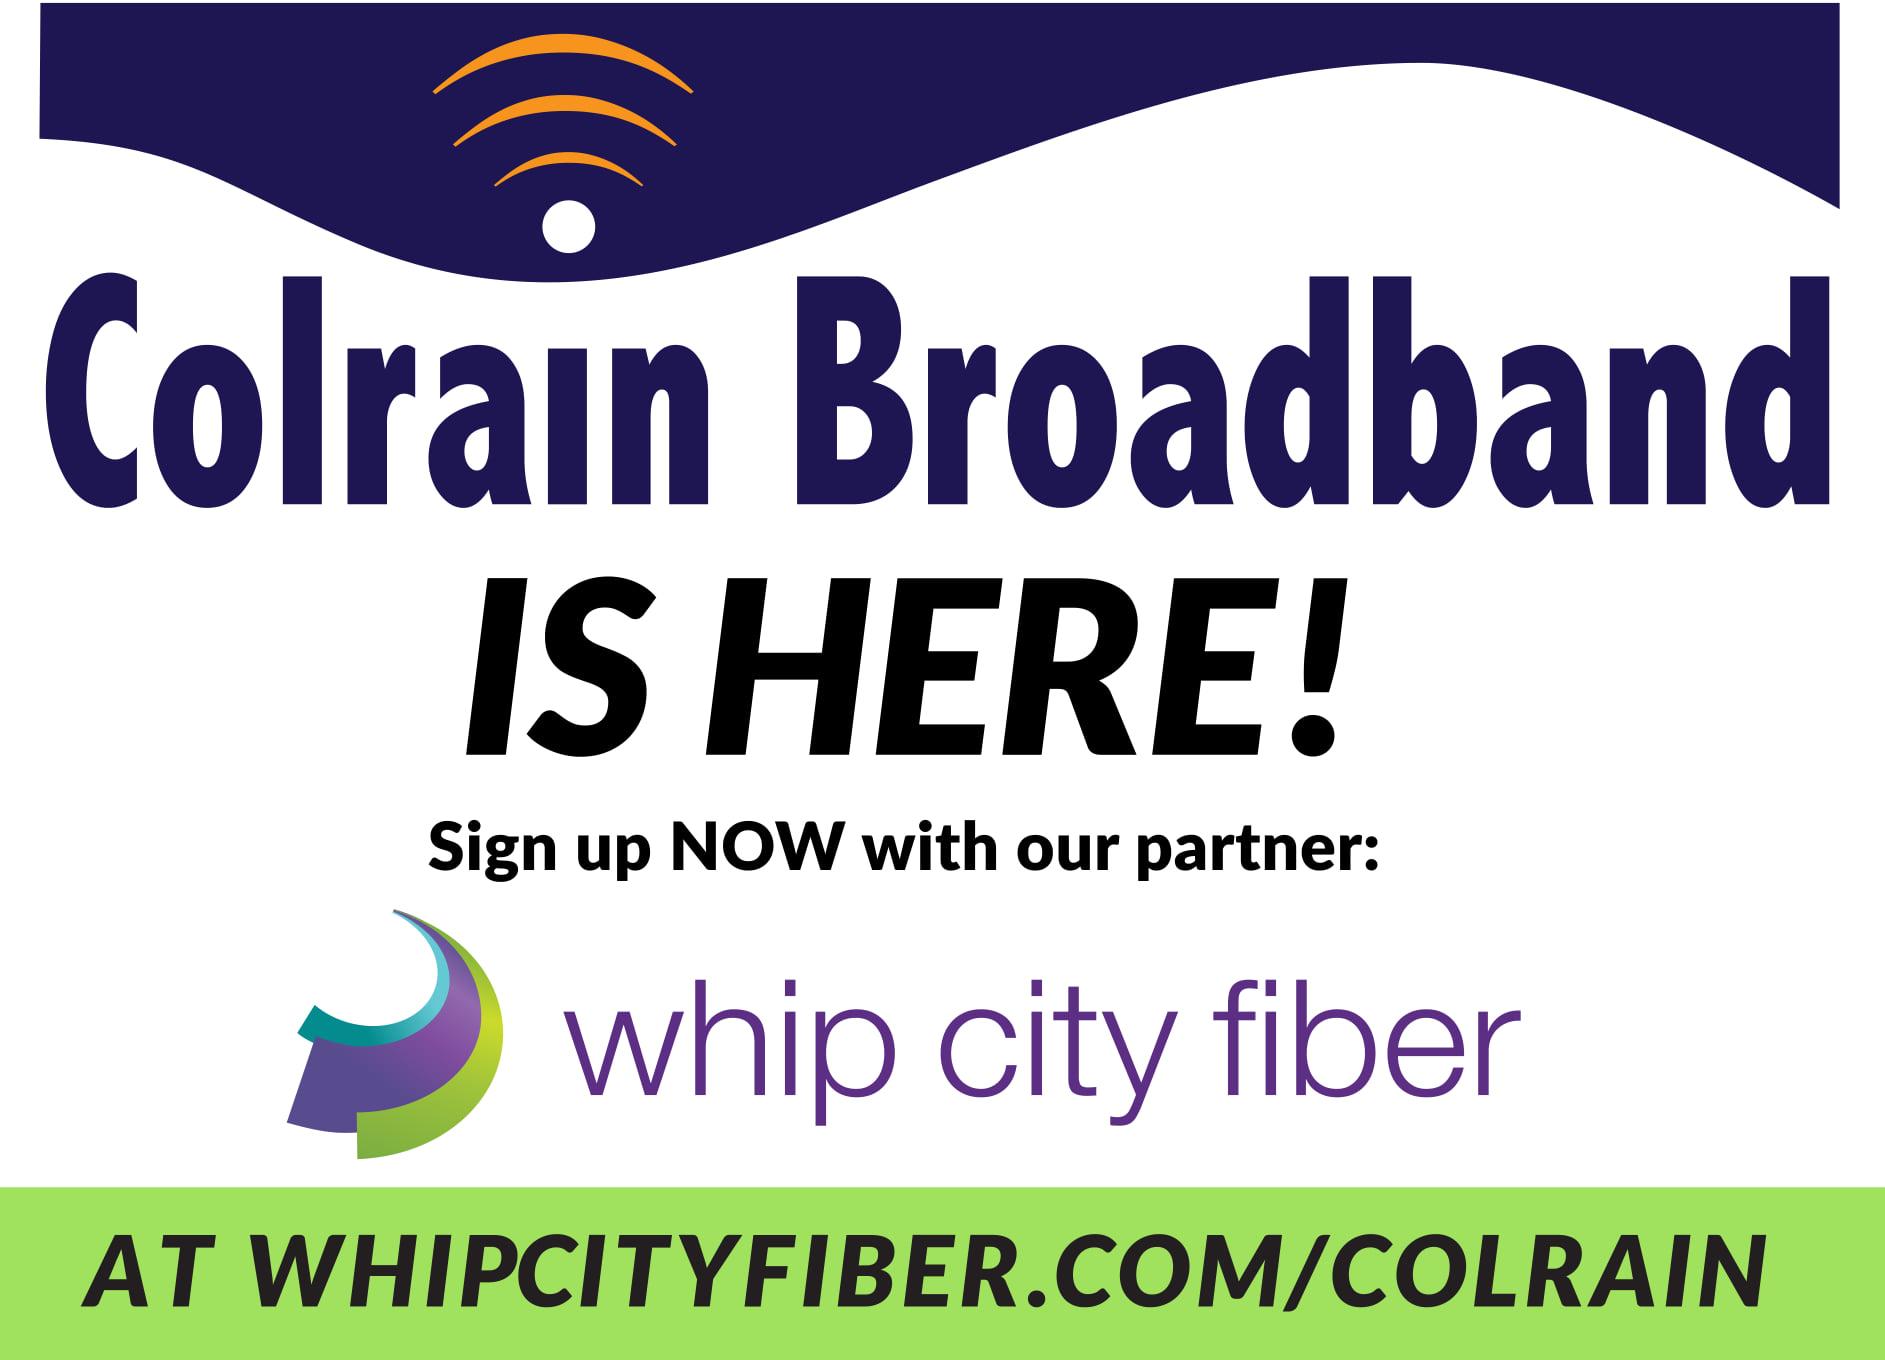 Colrain Broadband is here!